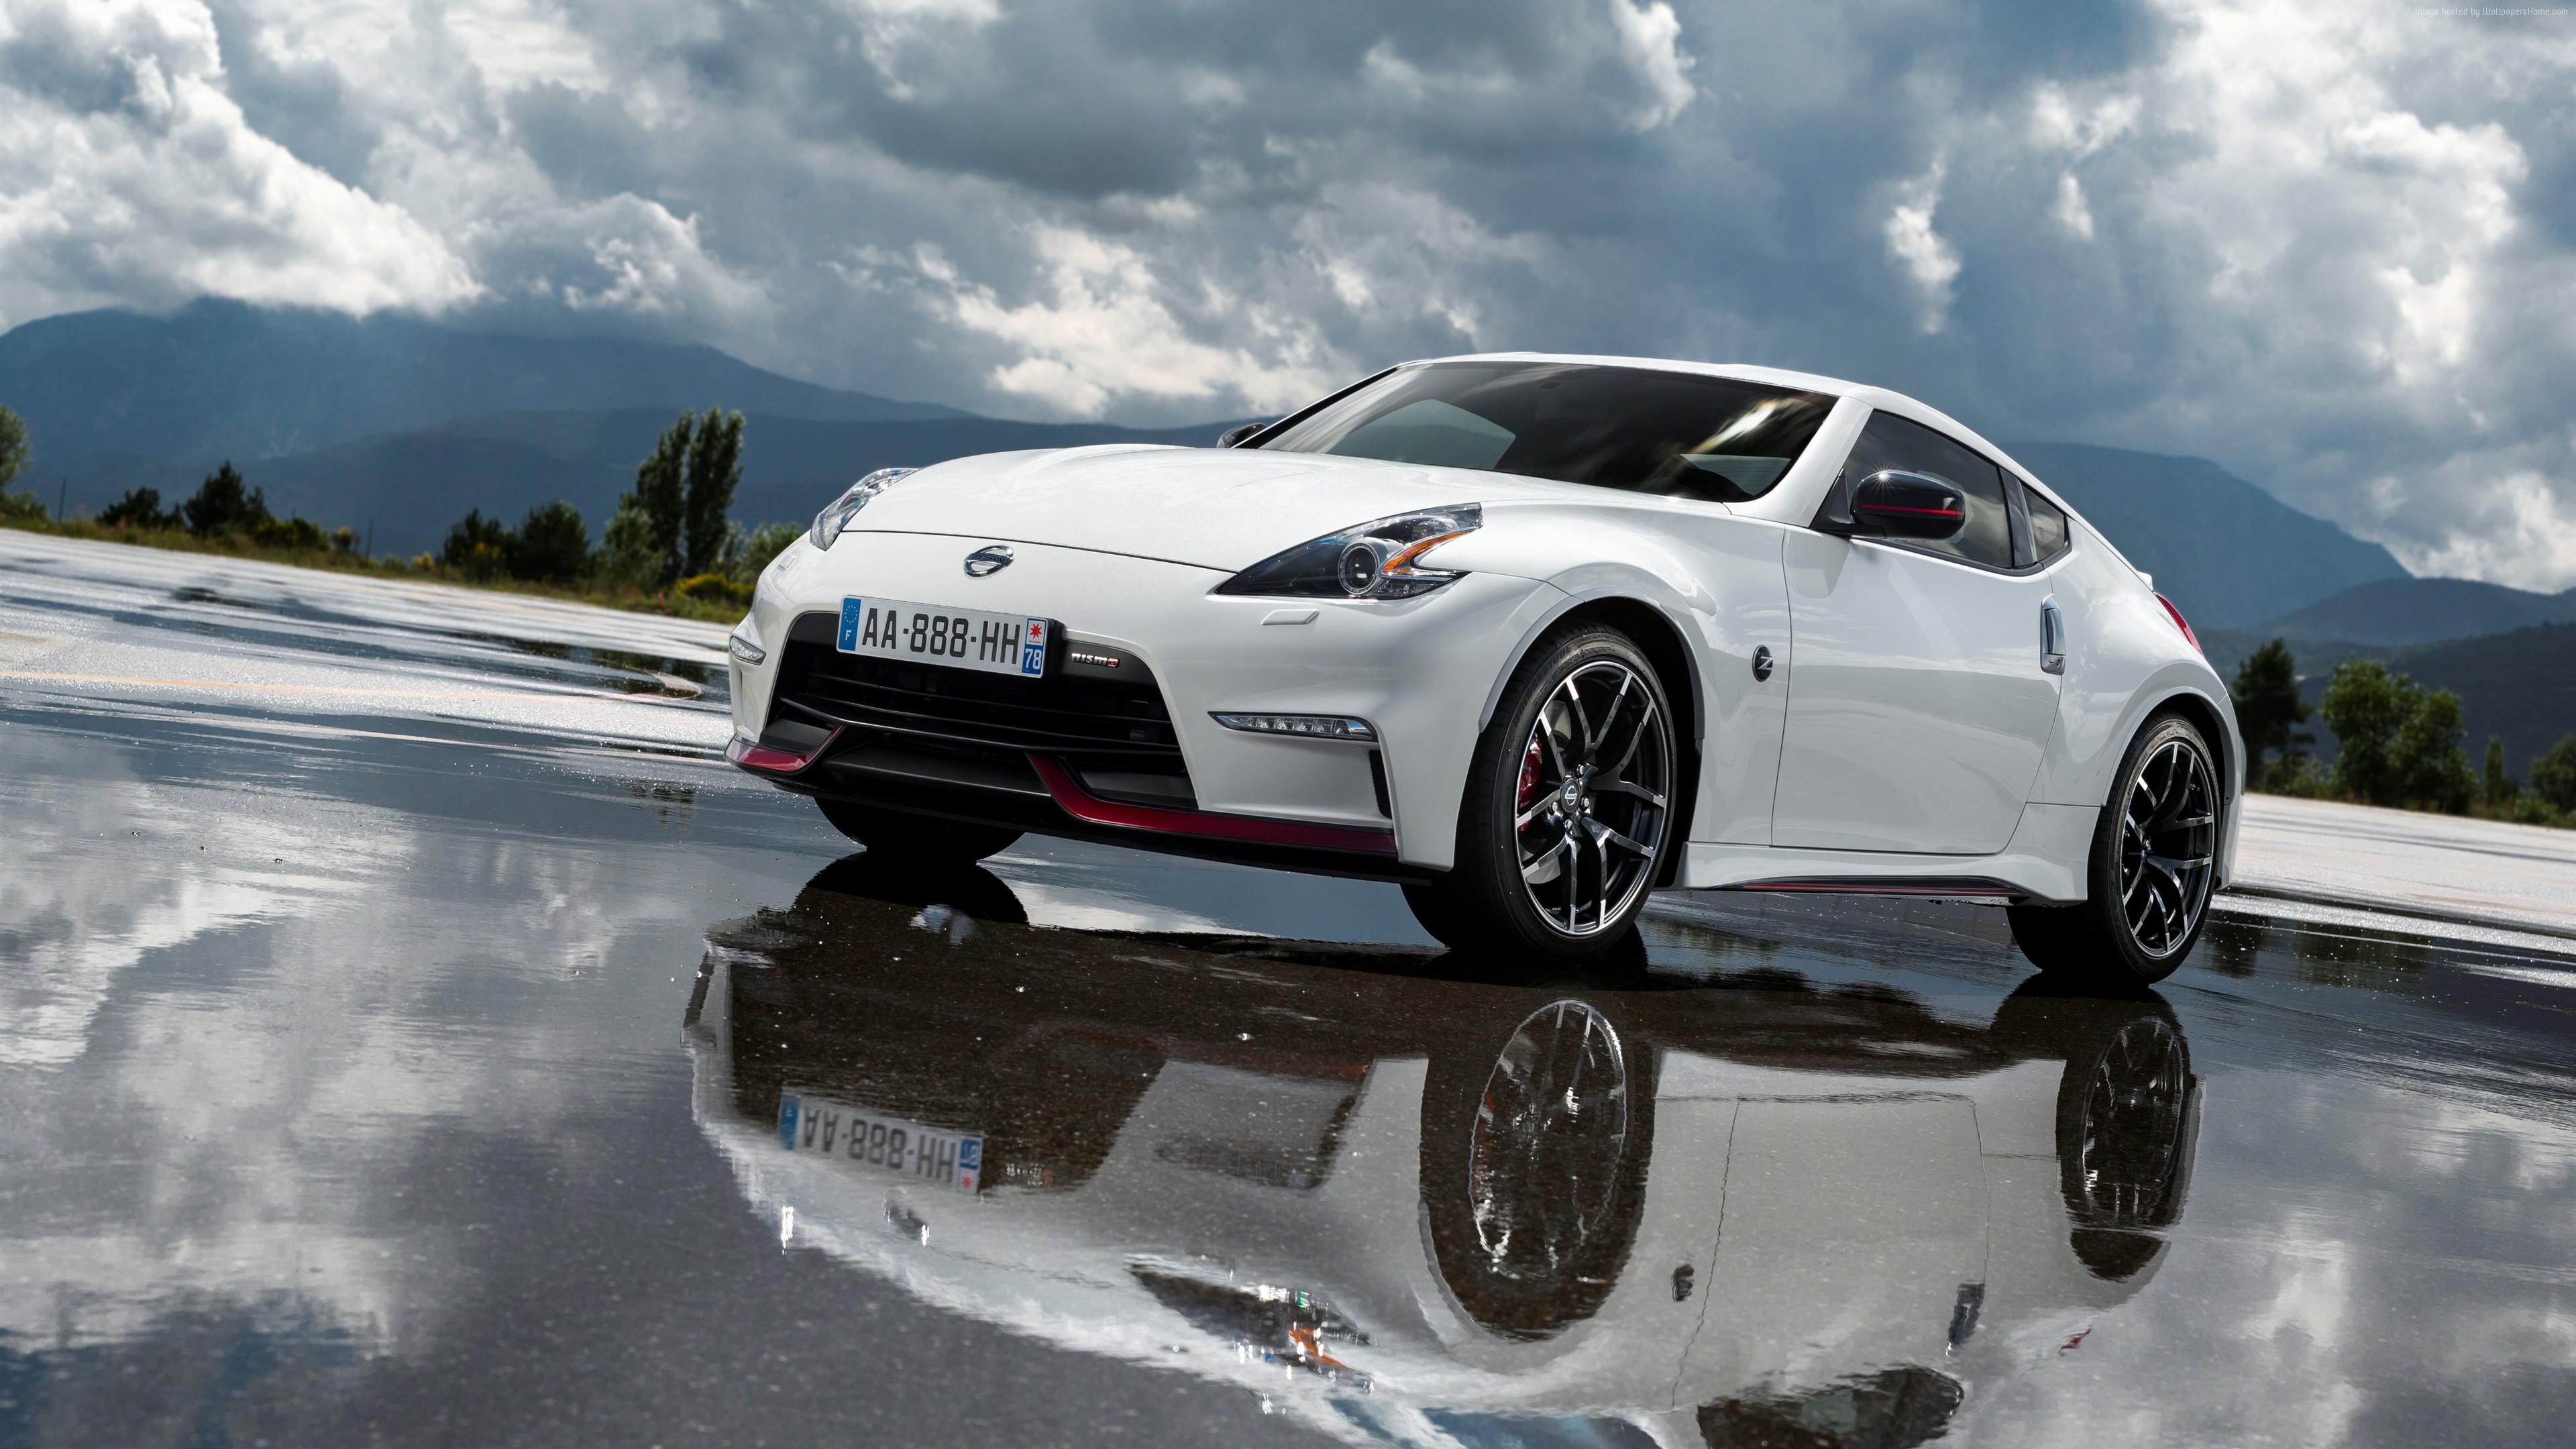 Wallpaper Race Cars Sports Car Nissan 370z Coupe Nismo Wheel